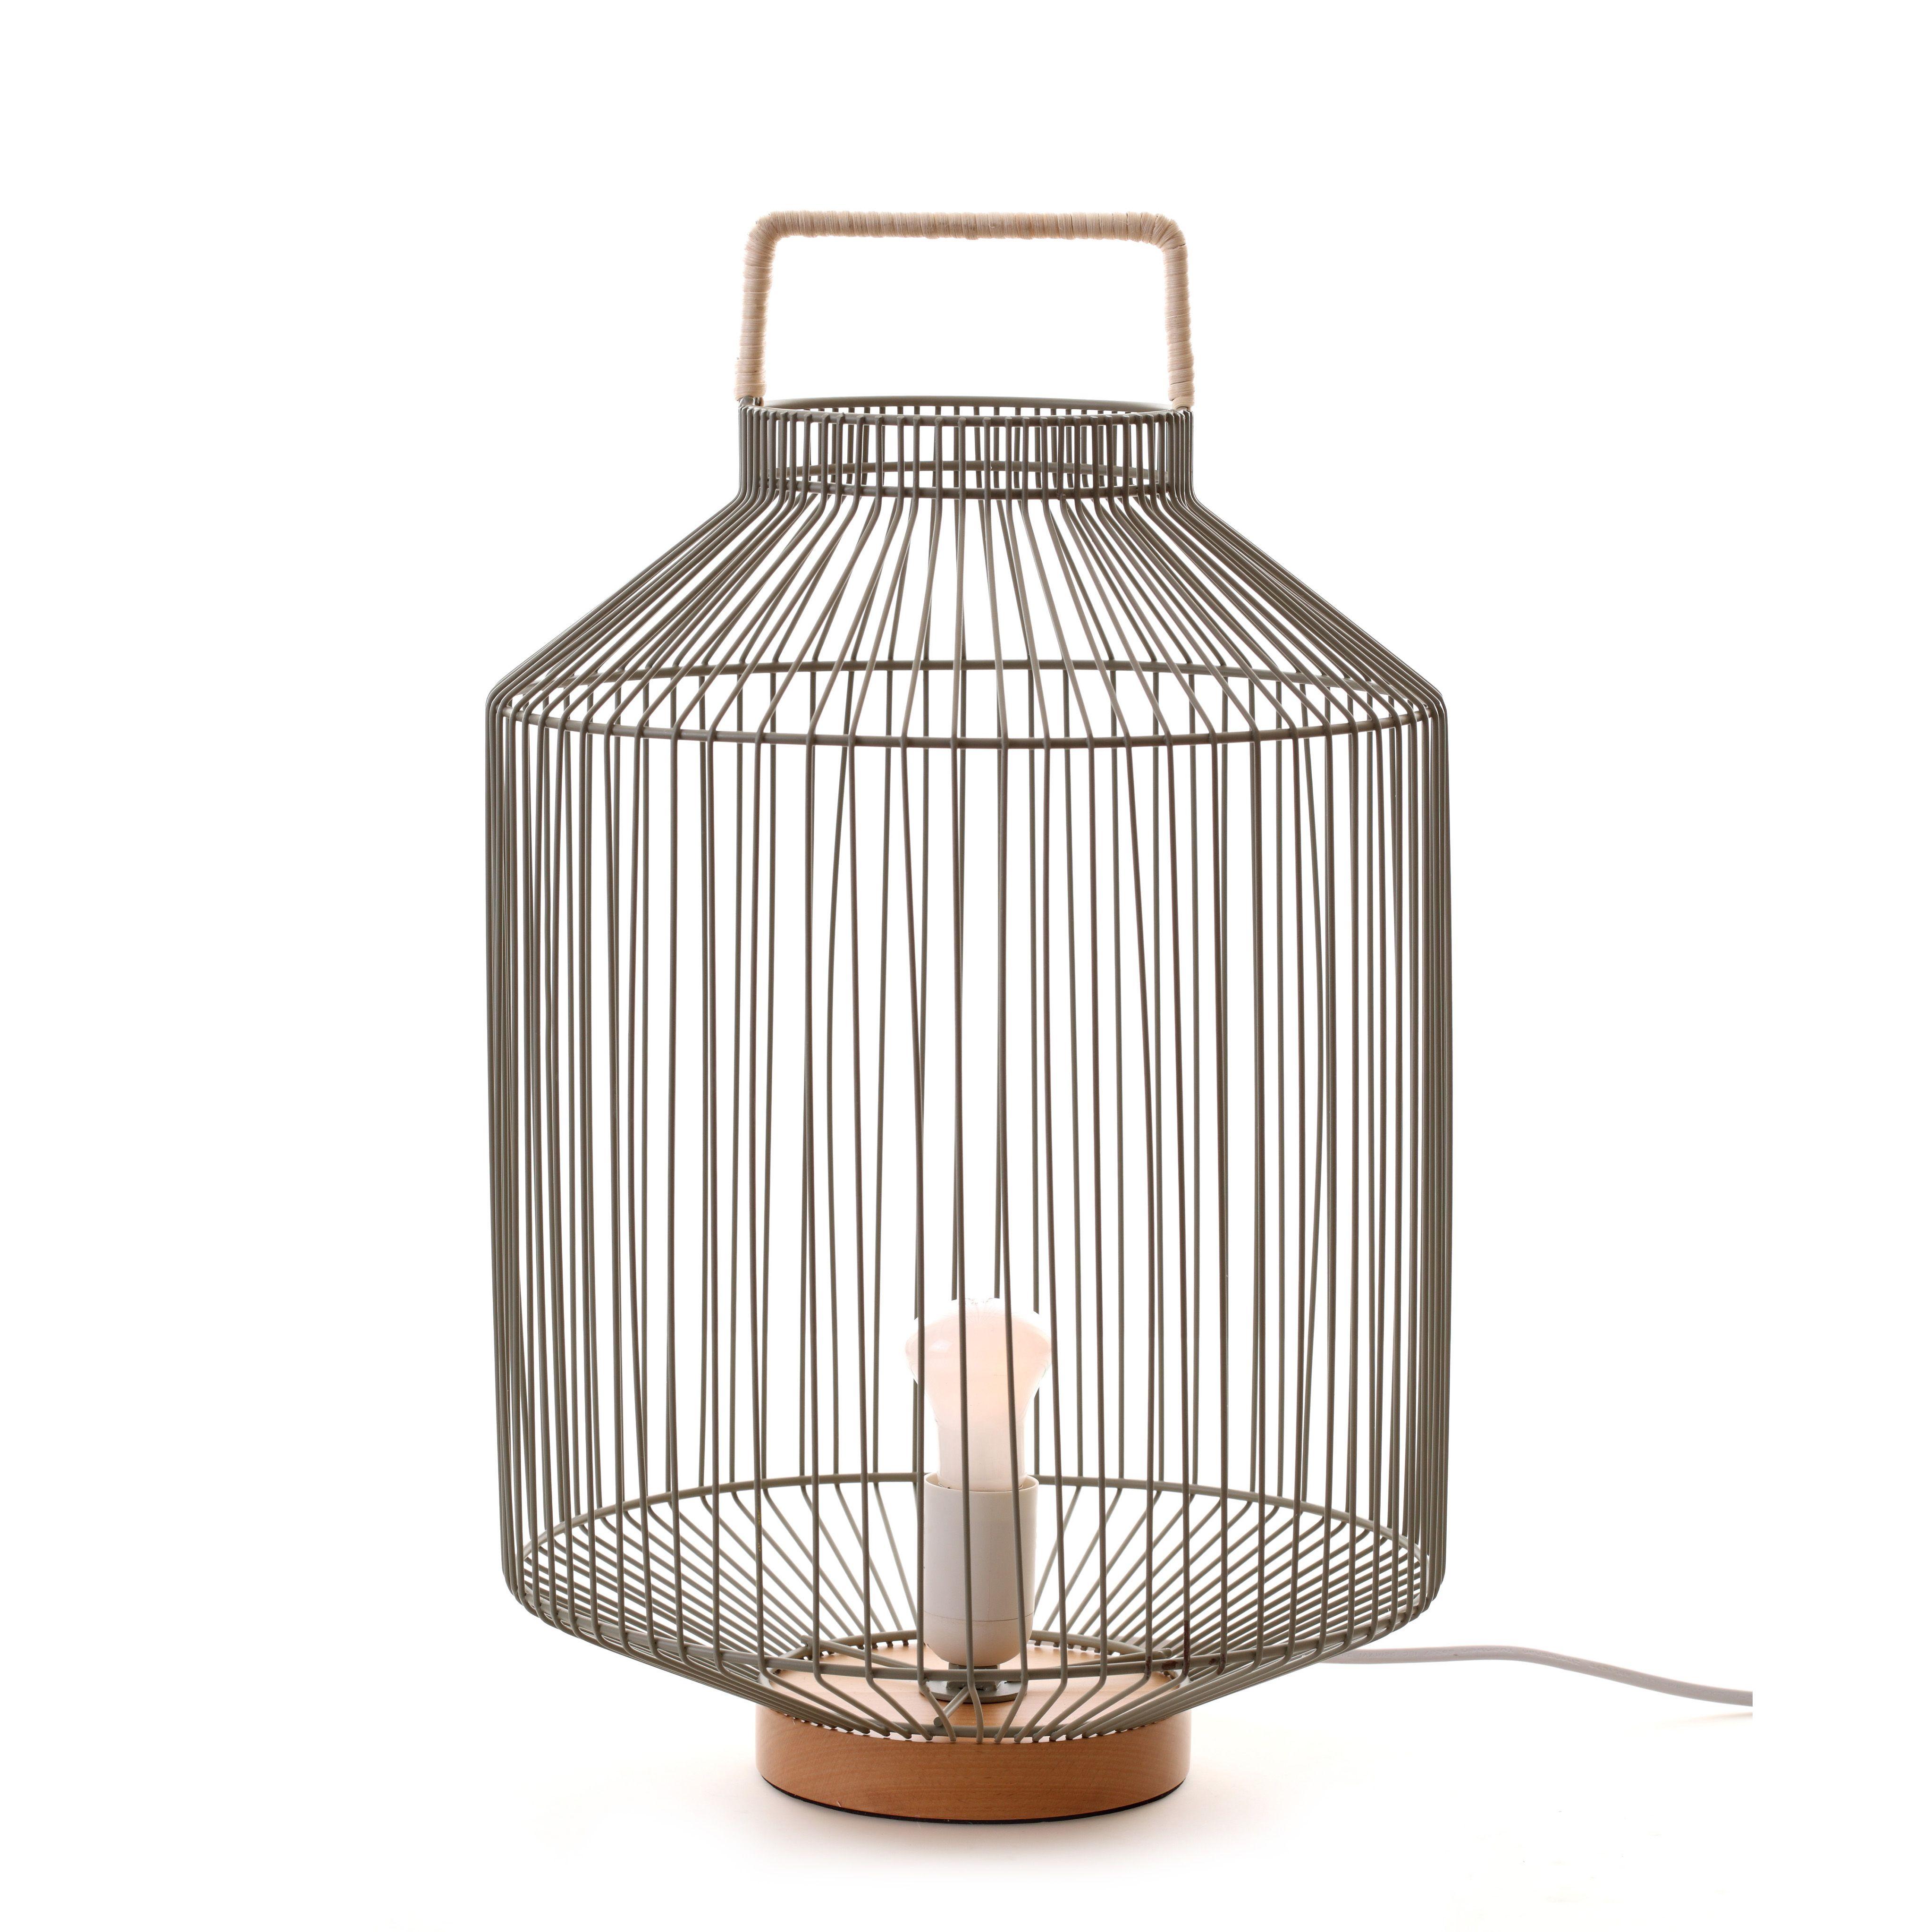 LAMPE À POSER CRAFTY EN MÉTAL VERT DE GRIS  Lampe à poser, Lampe